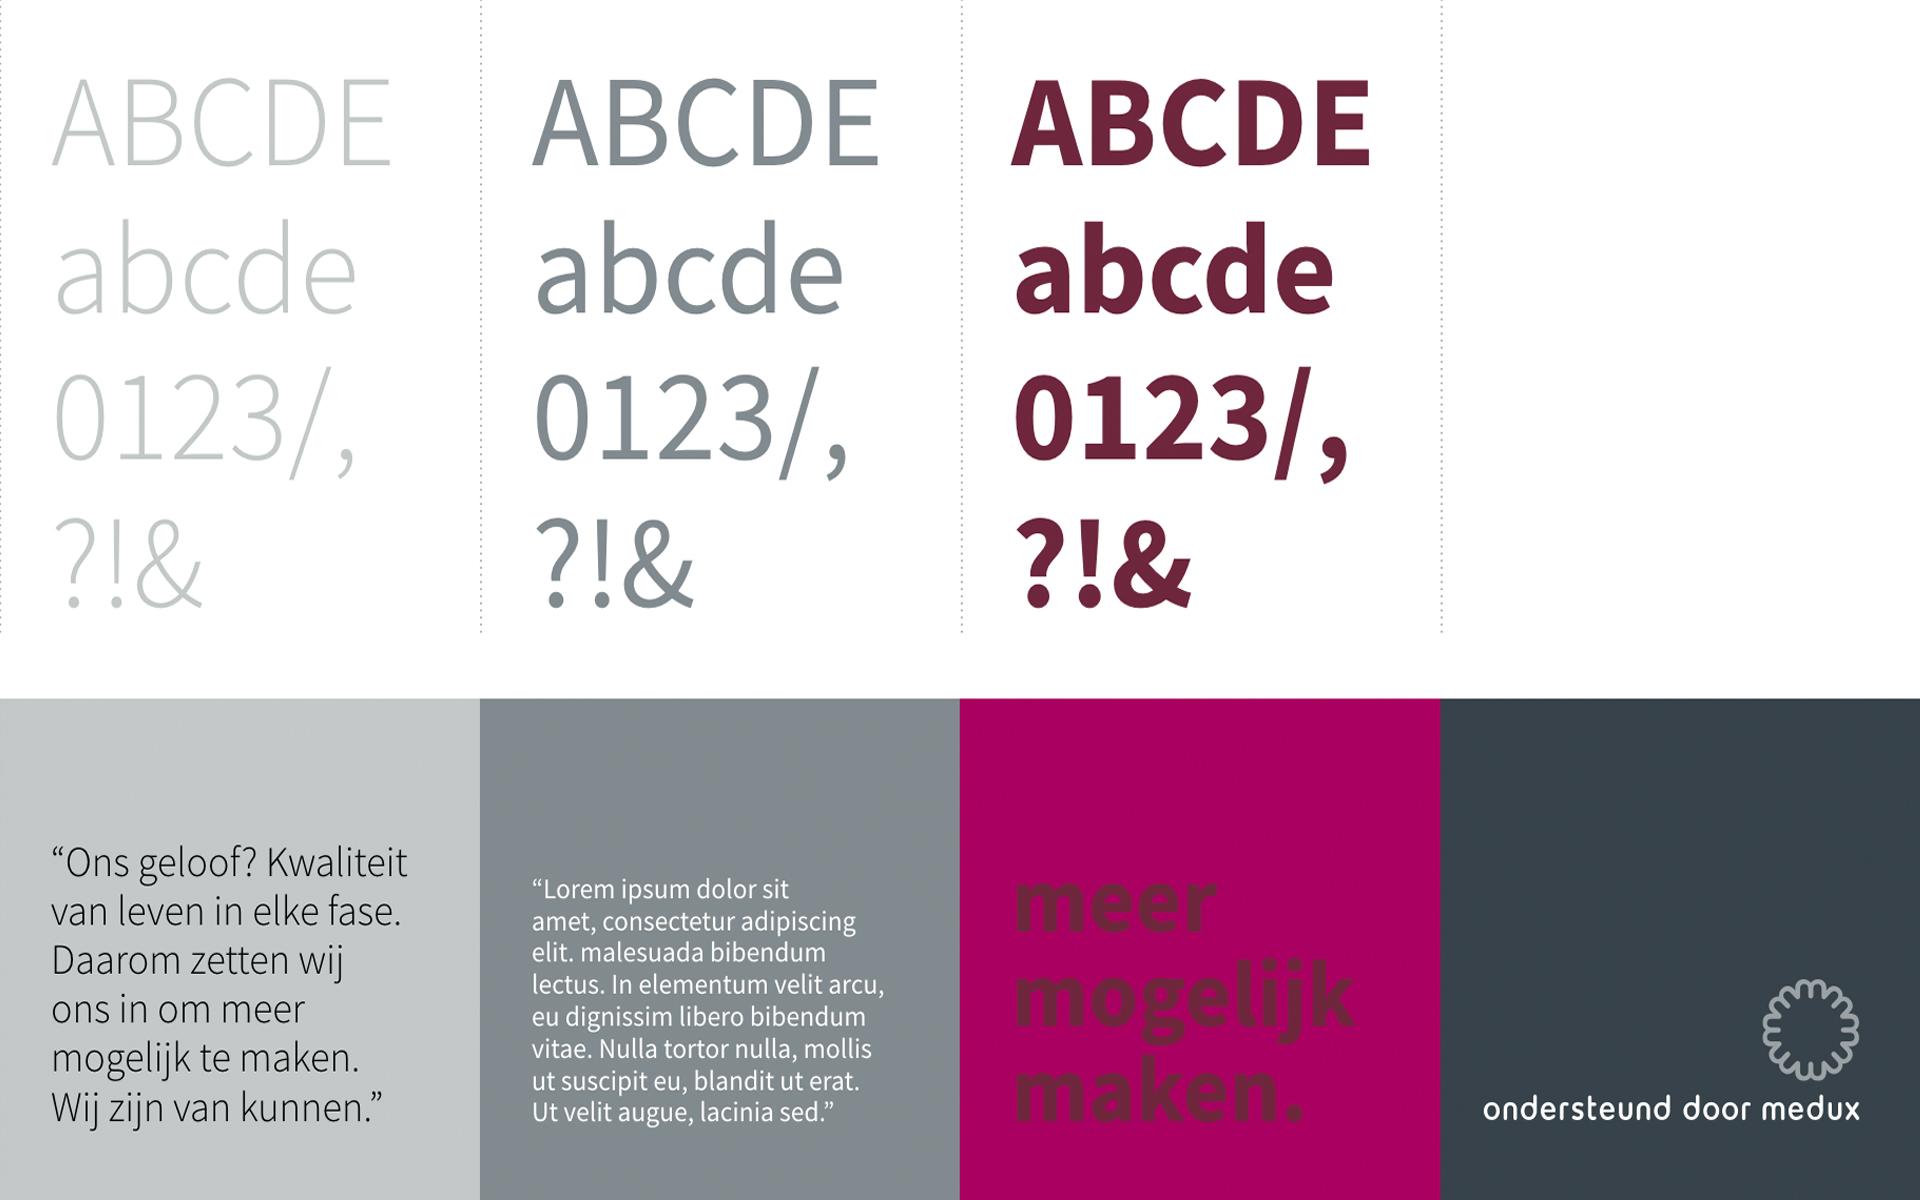 Medux font colours DAY Creative Strategic Consultancy / Brand Design